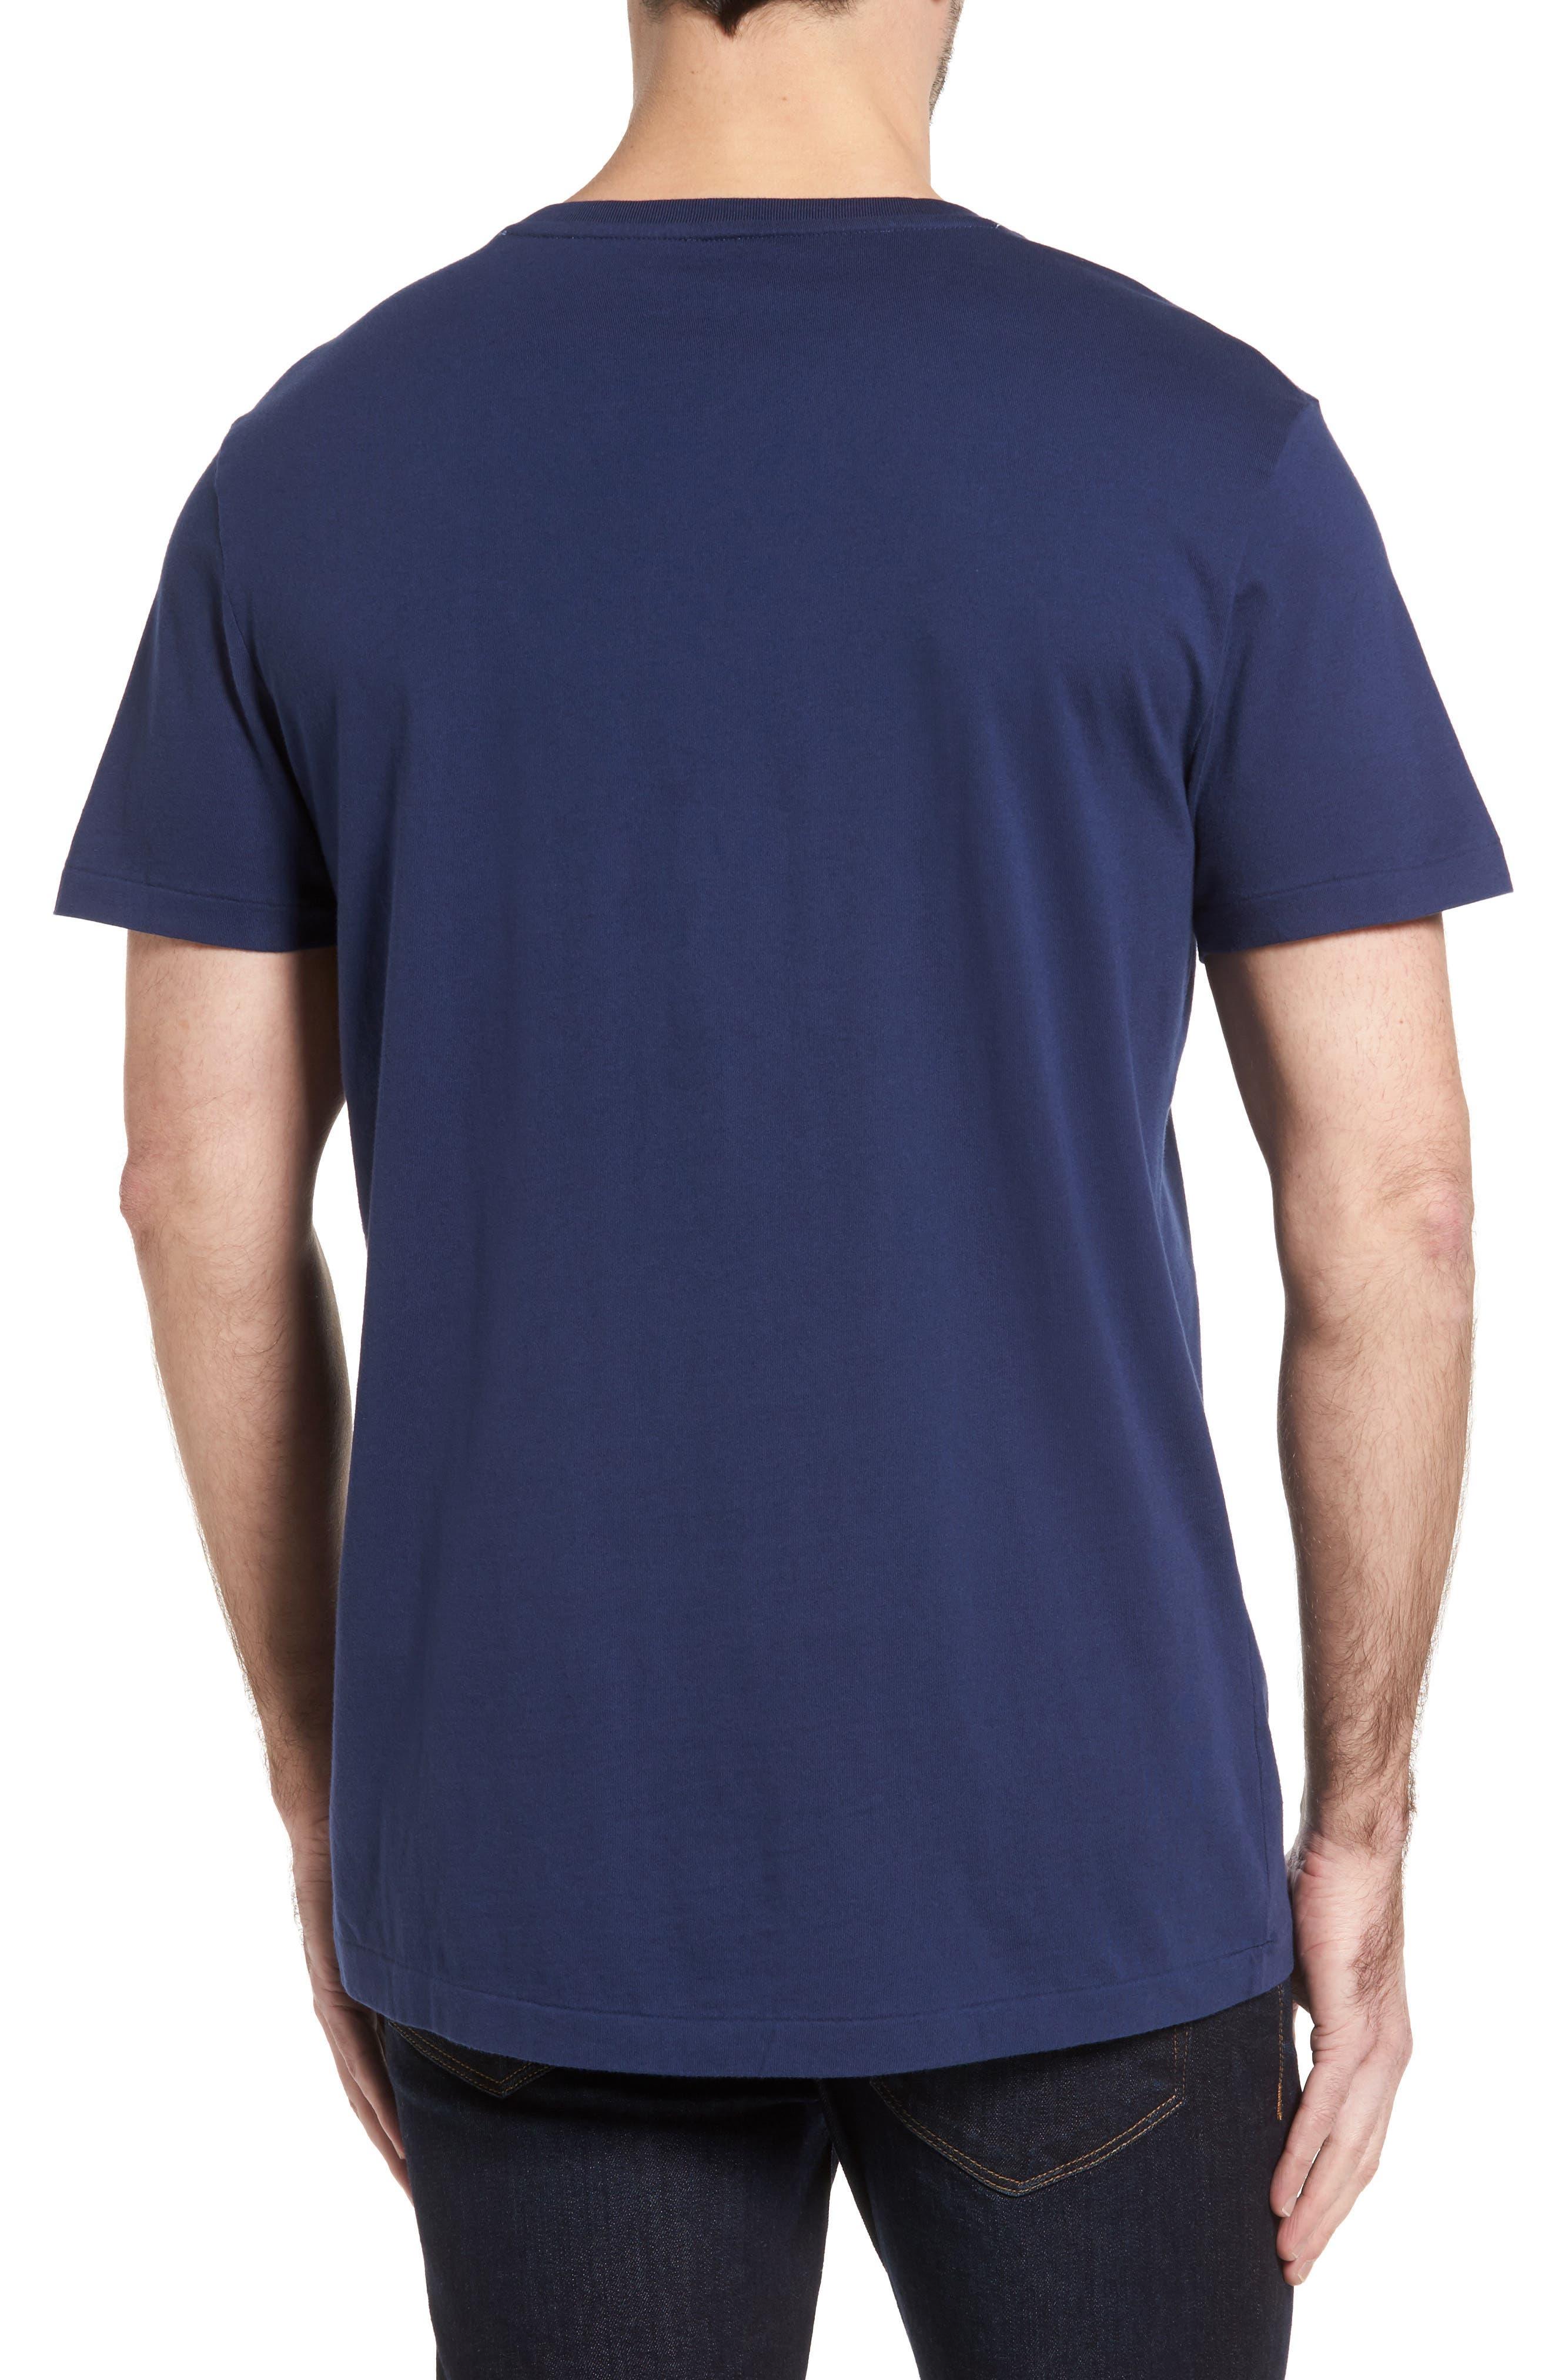 Alternate Image 2  - TailorByrd V-Neck T-Shirt